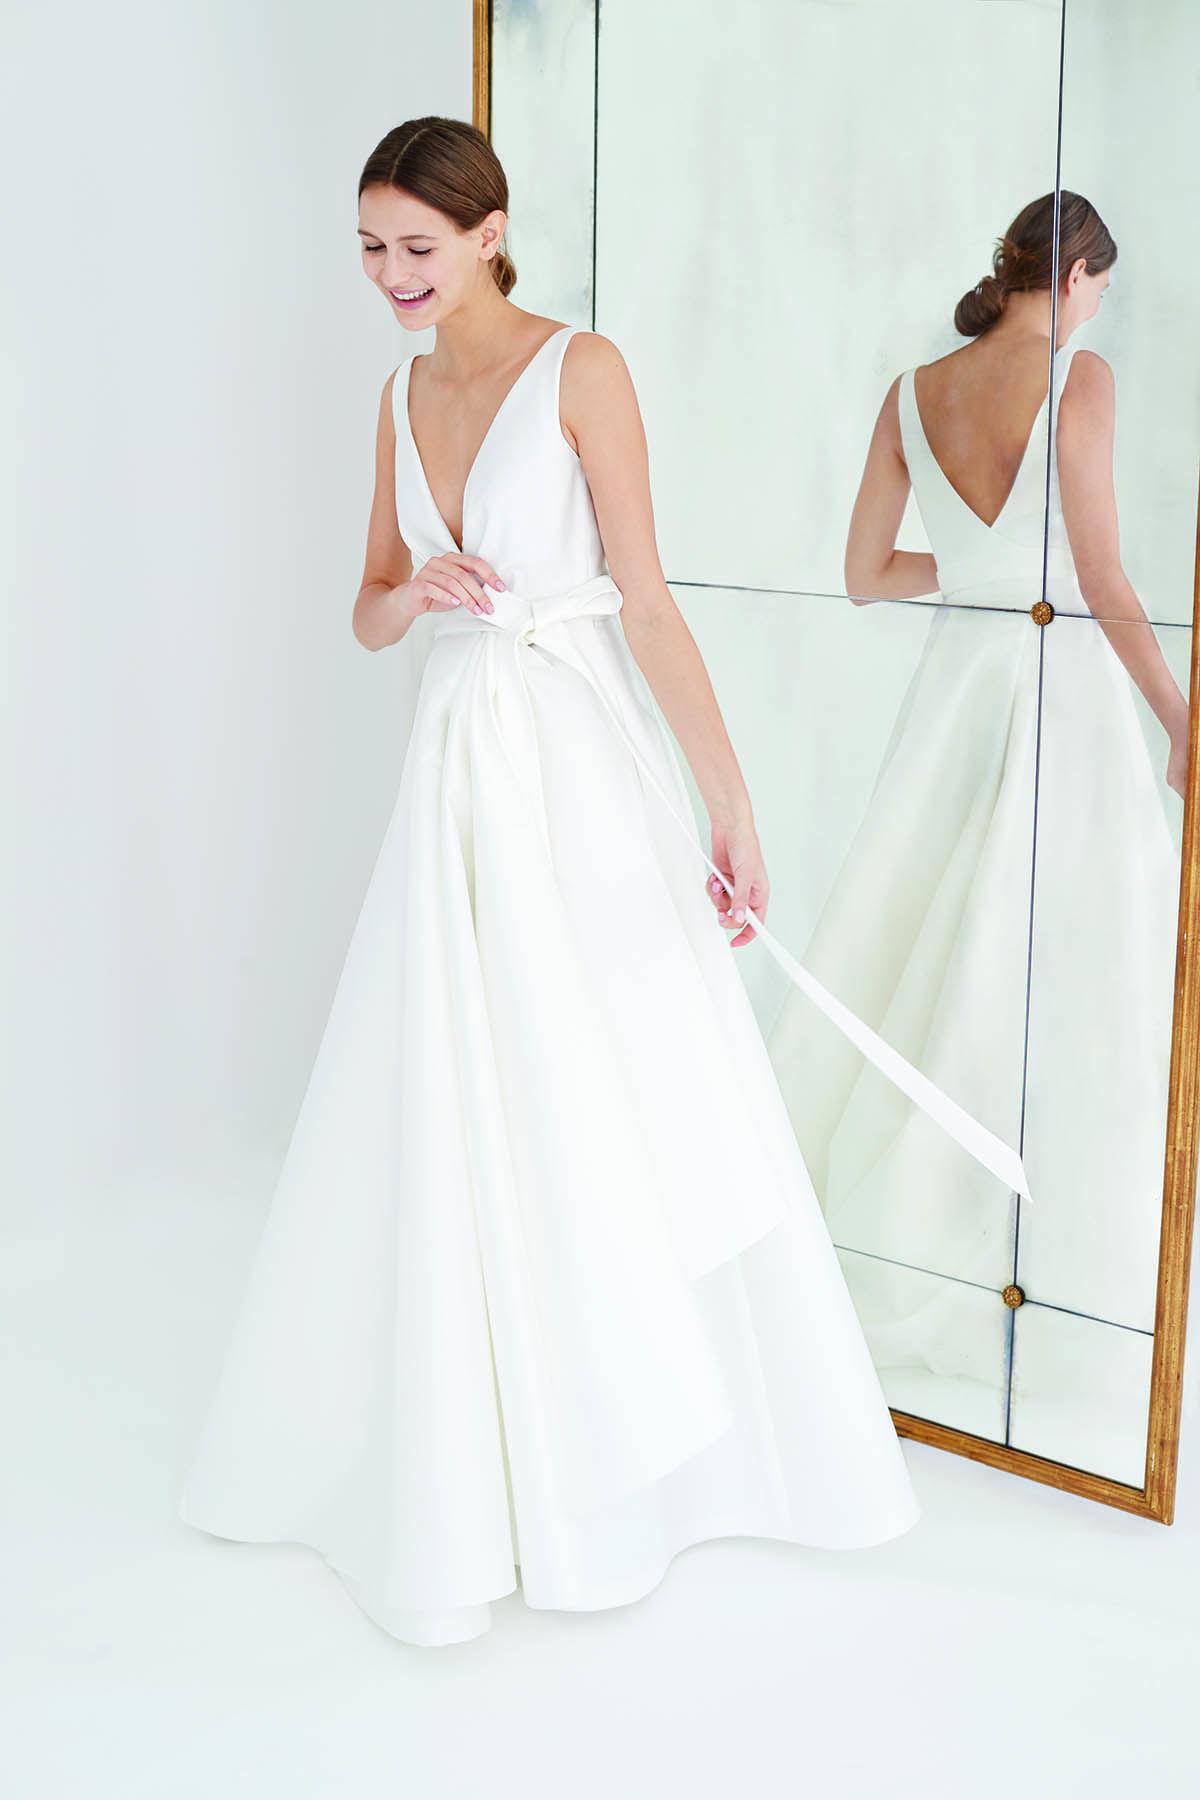 d9c84400f5308 Carolina Herrera Fall 2018 Bridal Collection | Wedding dresses in ...